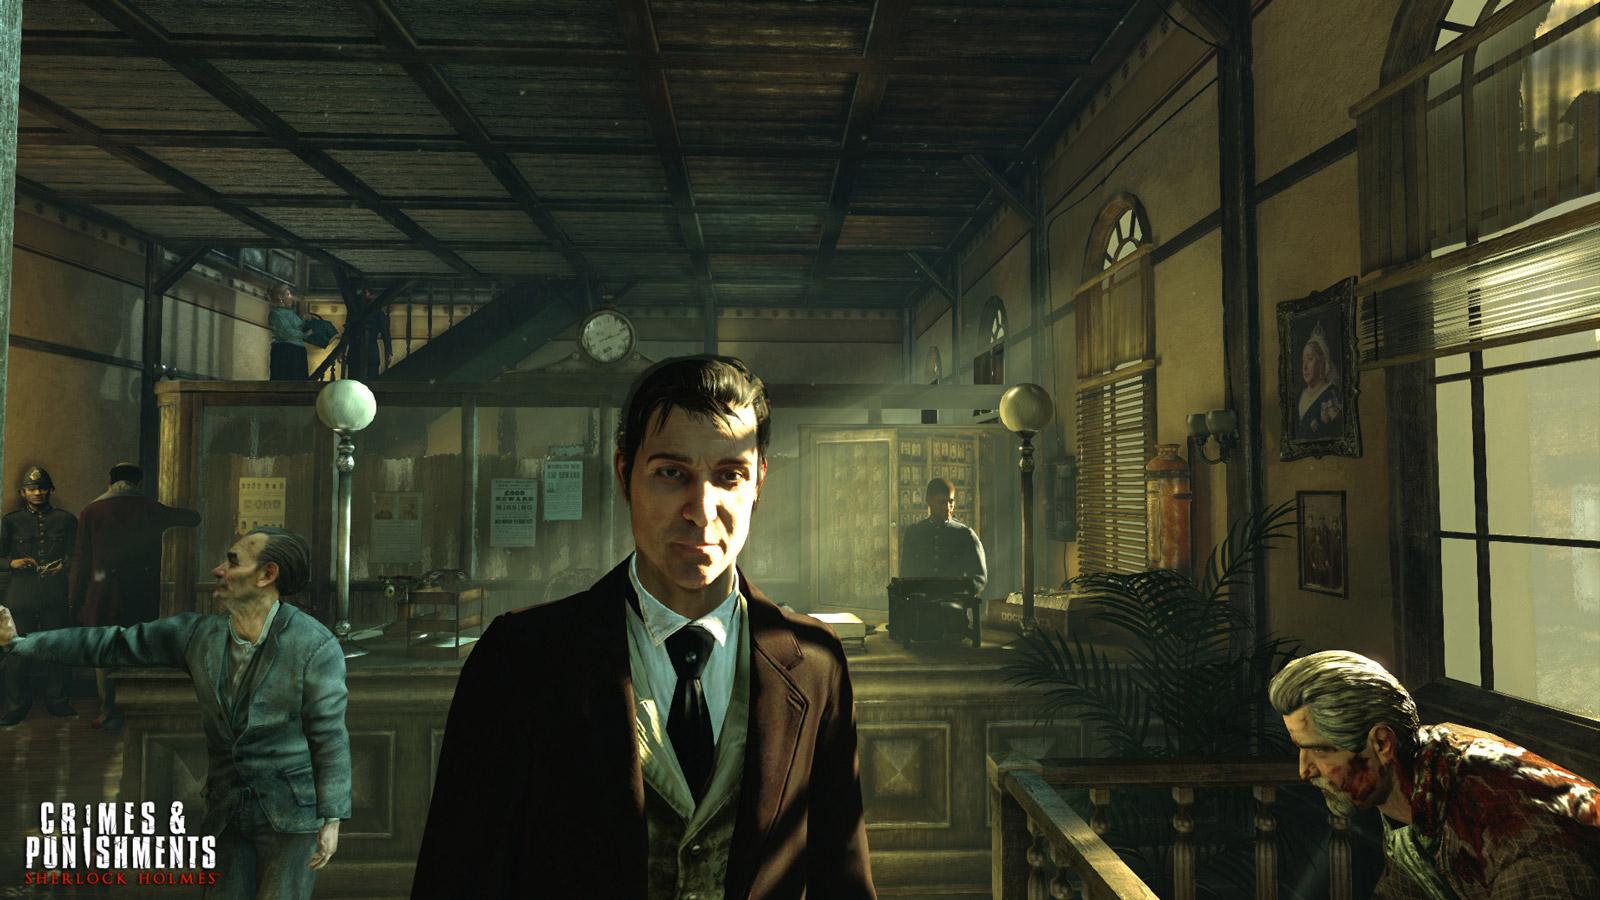 Free Sherlock Holmes: Crimes & Punishments Wallpaper in 1600x900